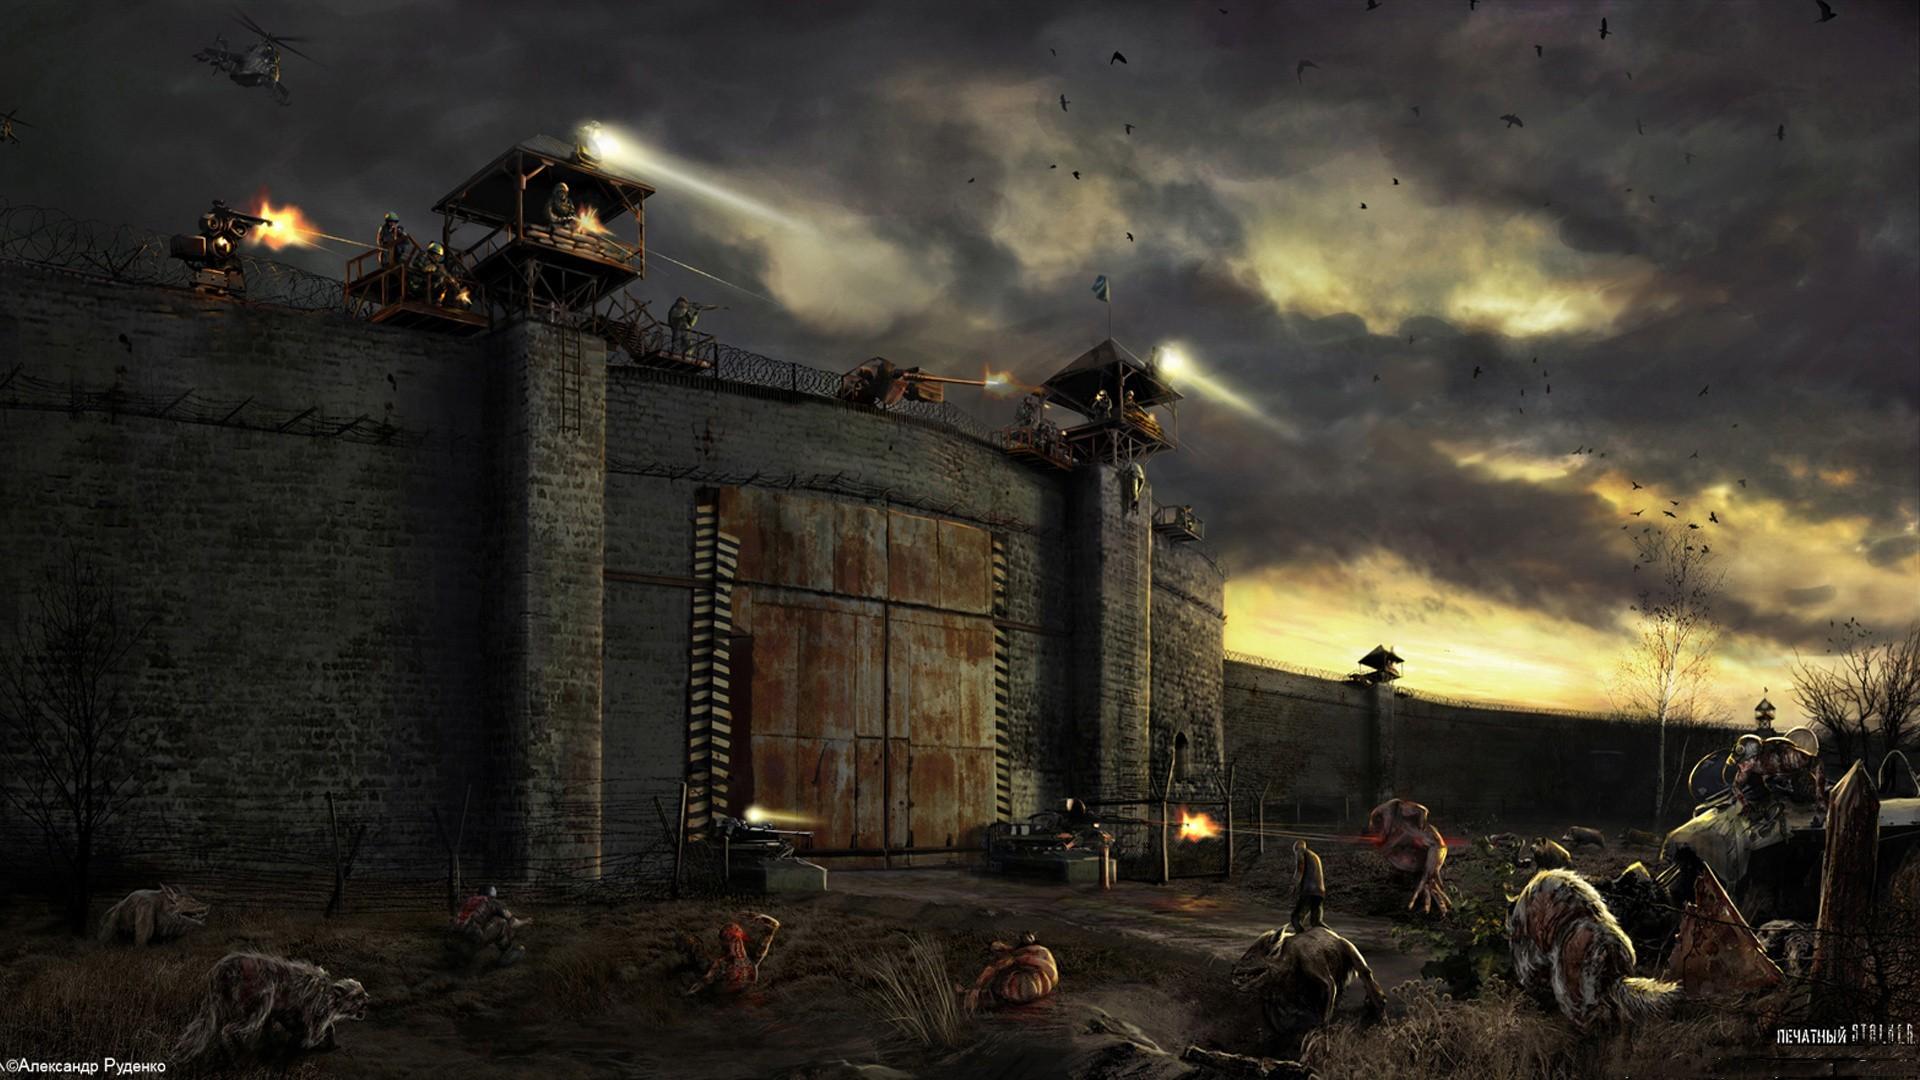 Nuclear Apocalypse Wallpaper ·① WallpaperTag